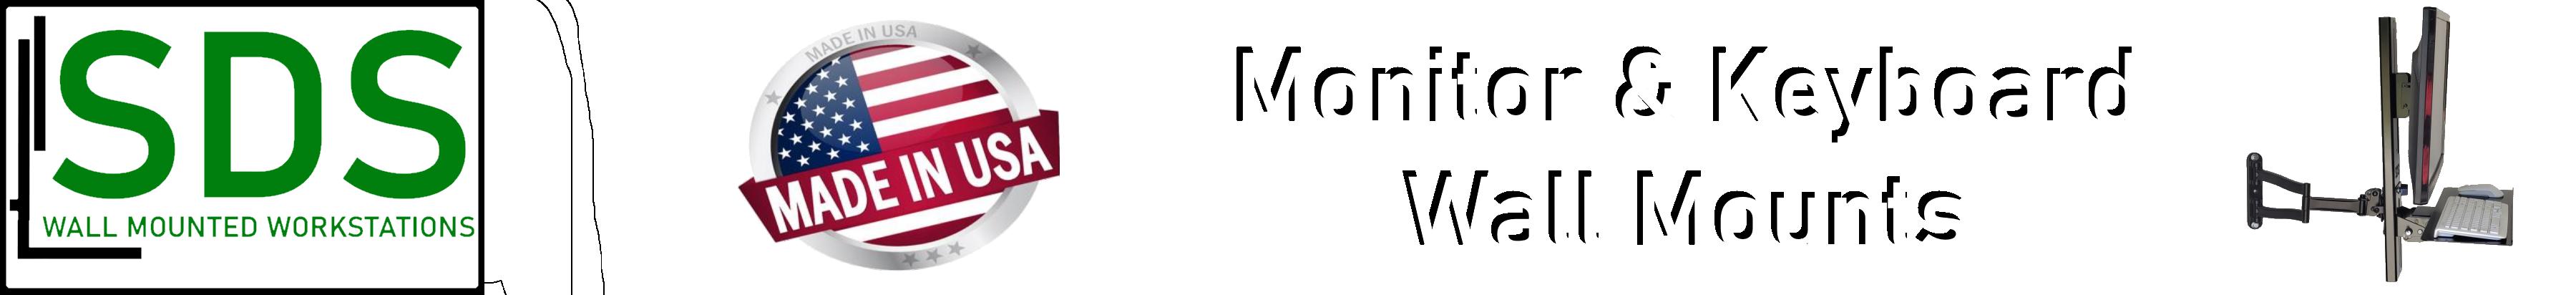 VESA Monitor & Keyboard Workstations by SDS